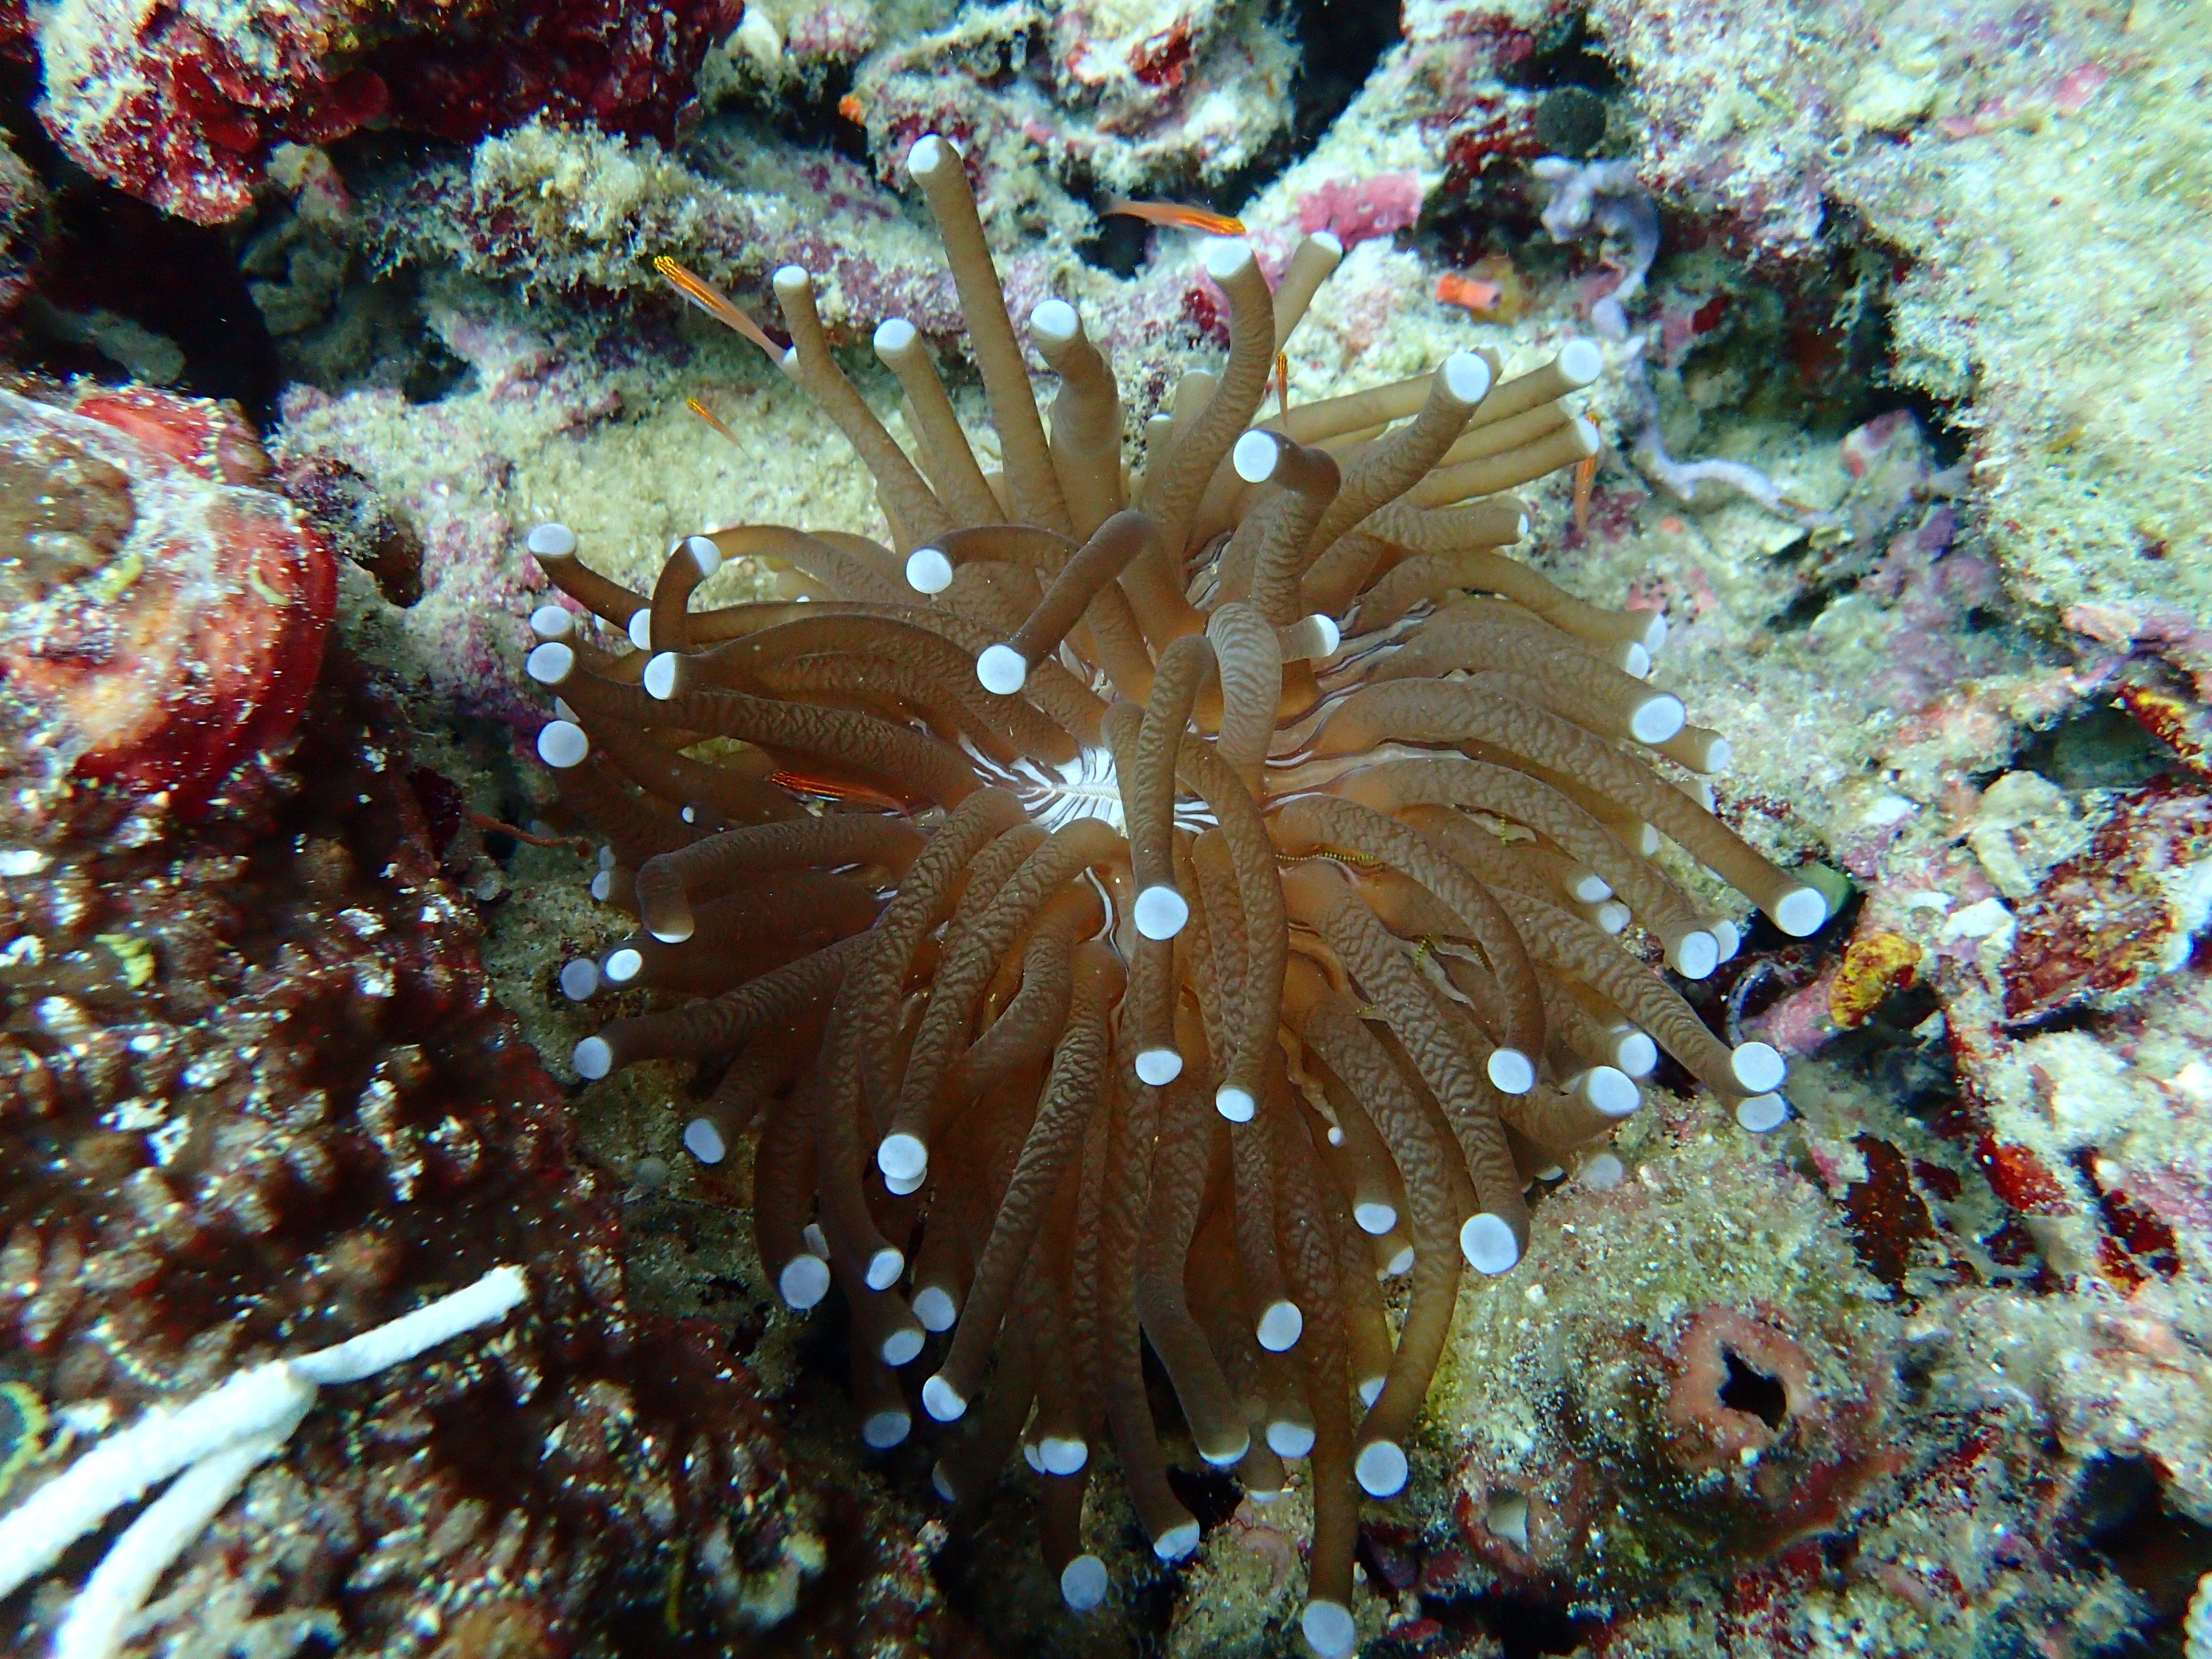 Heliofungia coral at Bawah Reserve